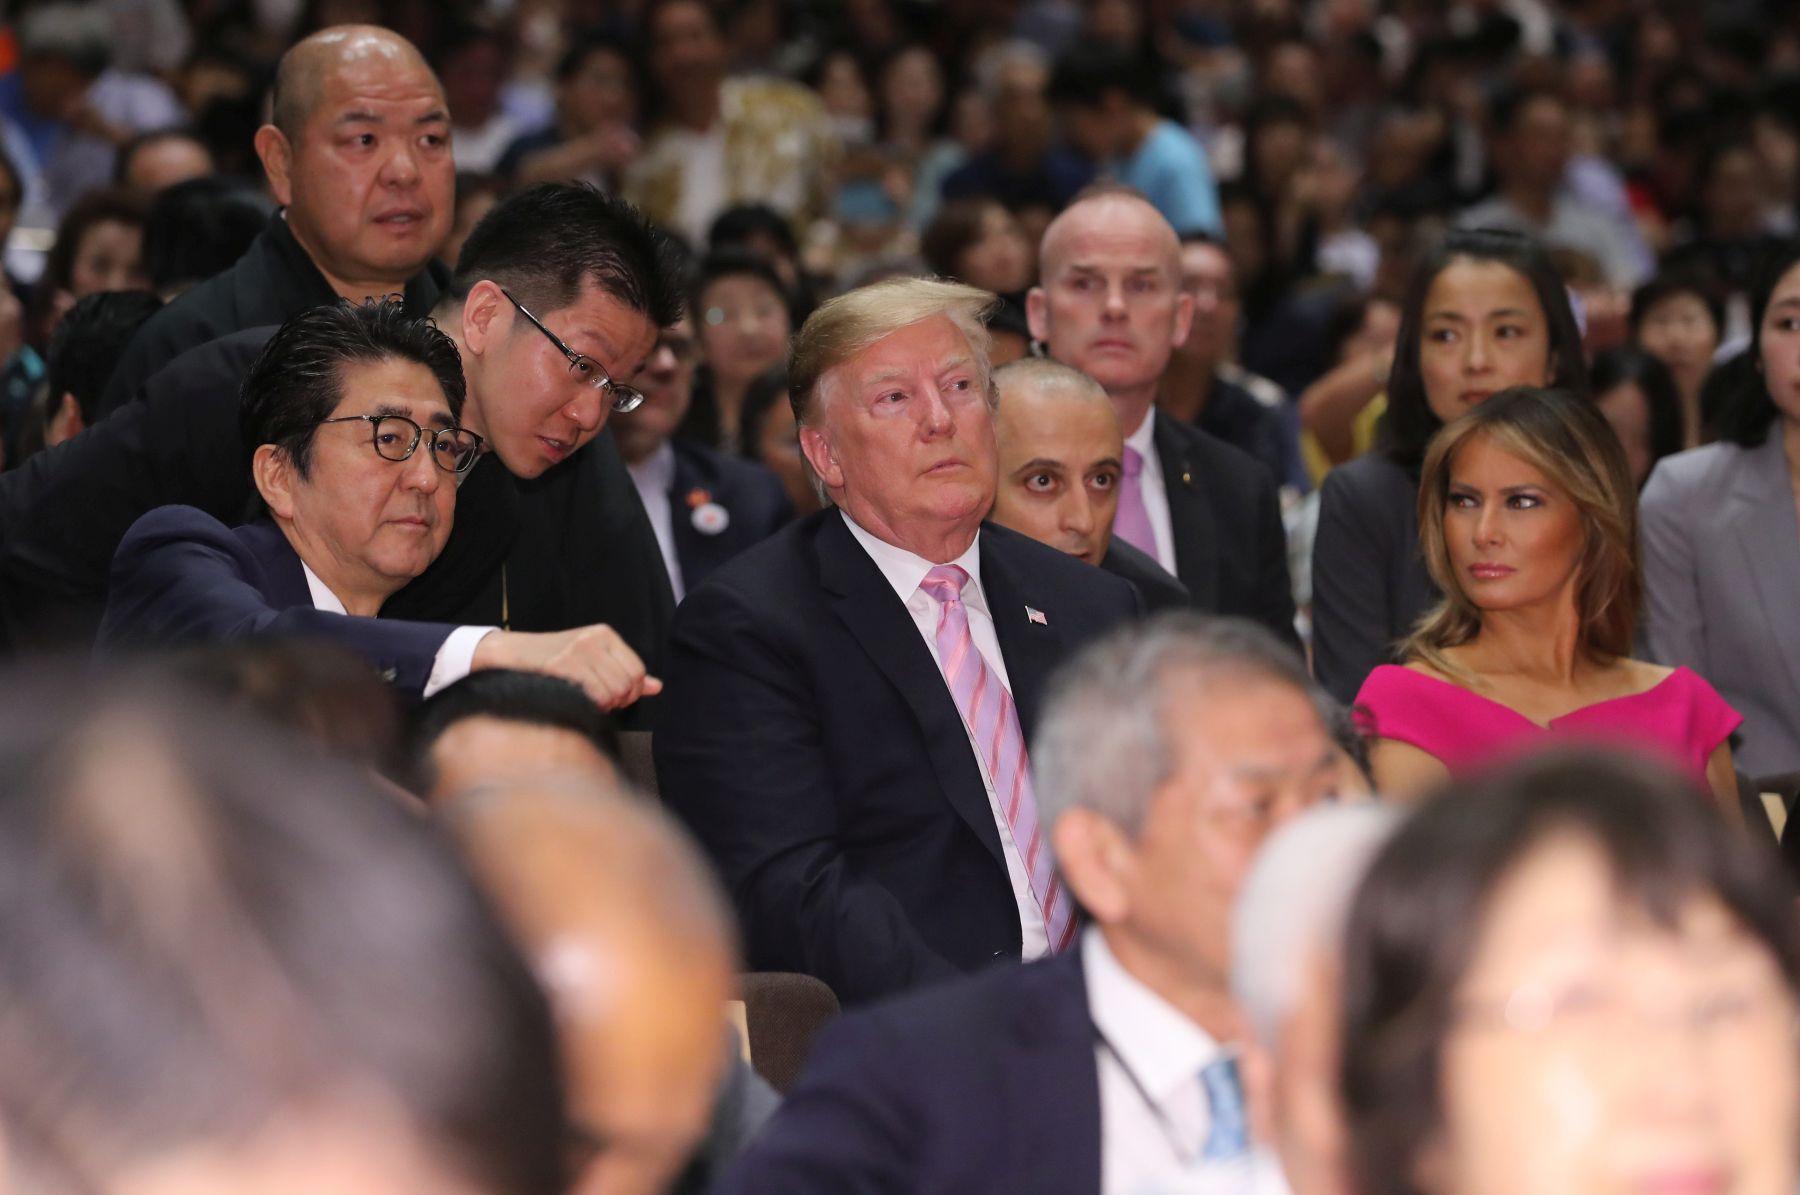 President Trump U.S. Cup to Japan Sumo Wrestler 010